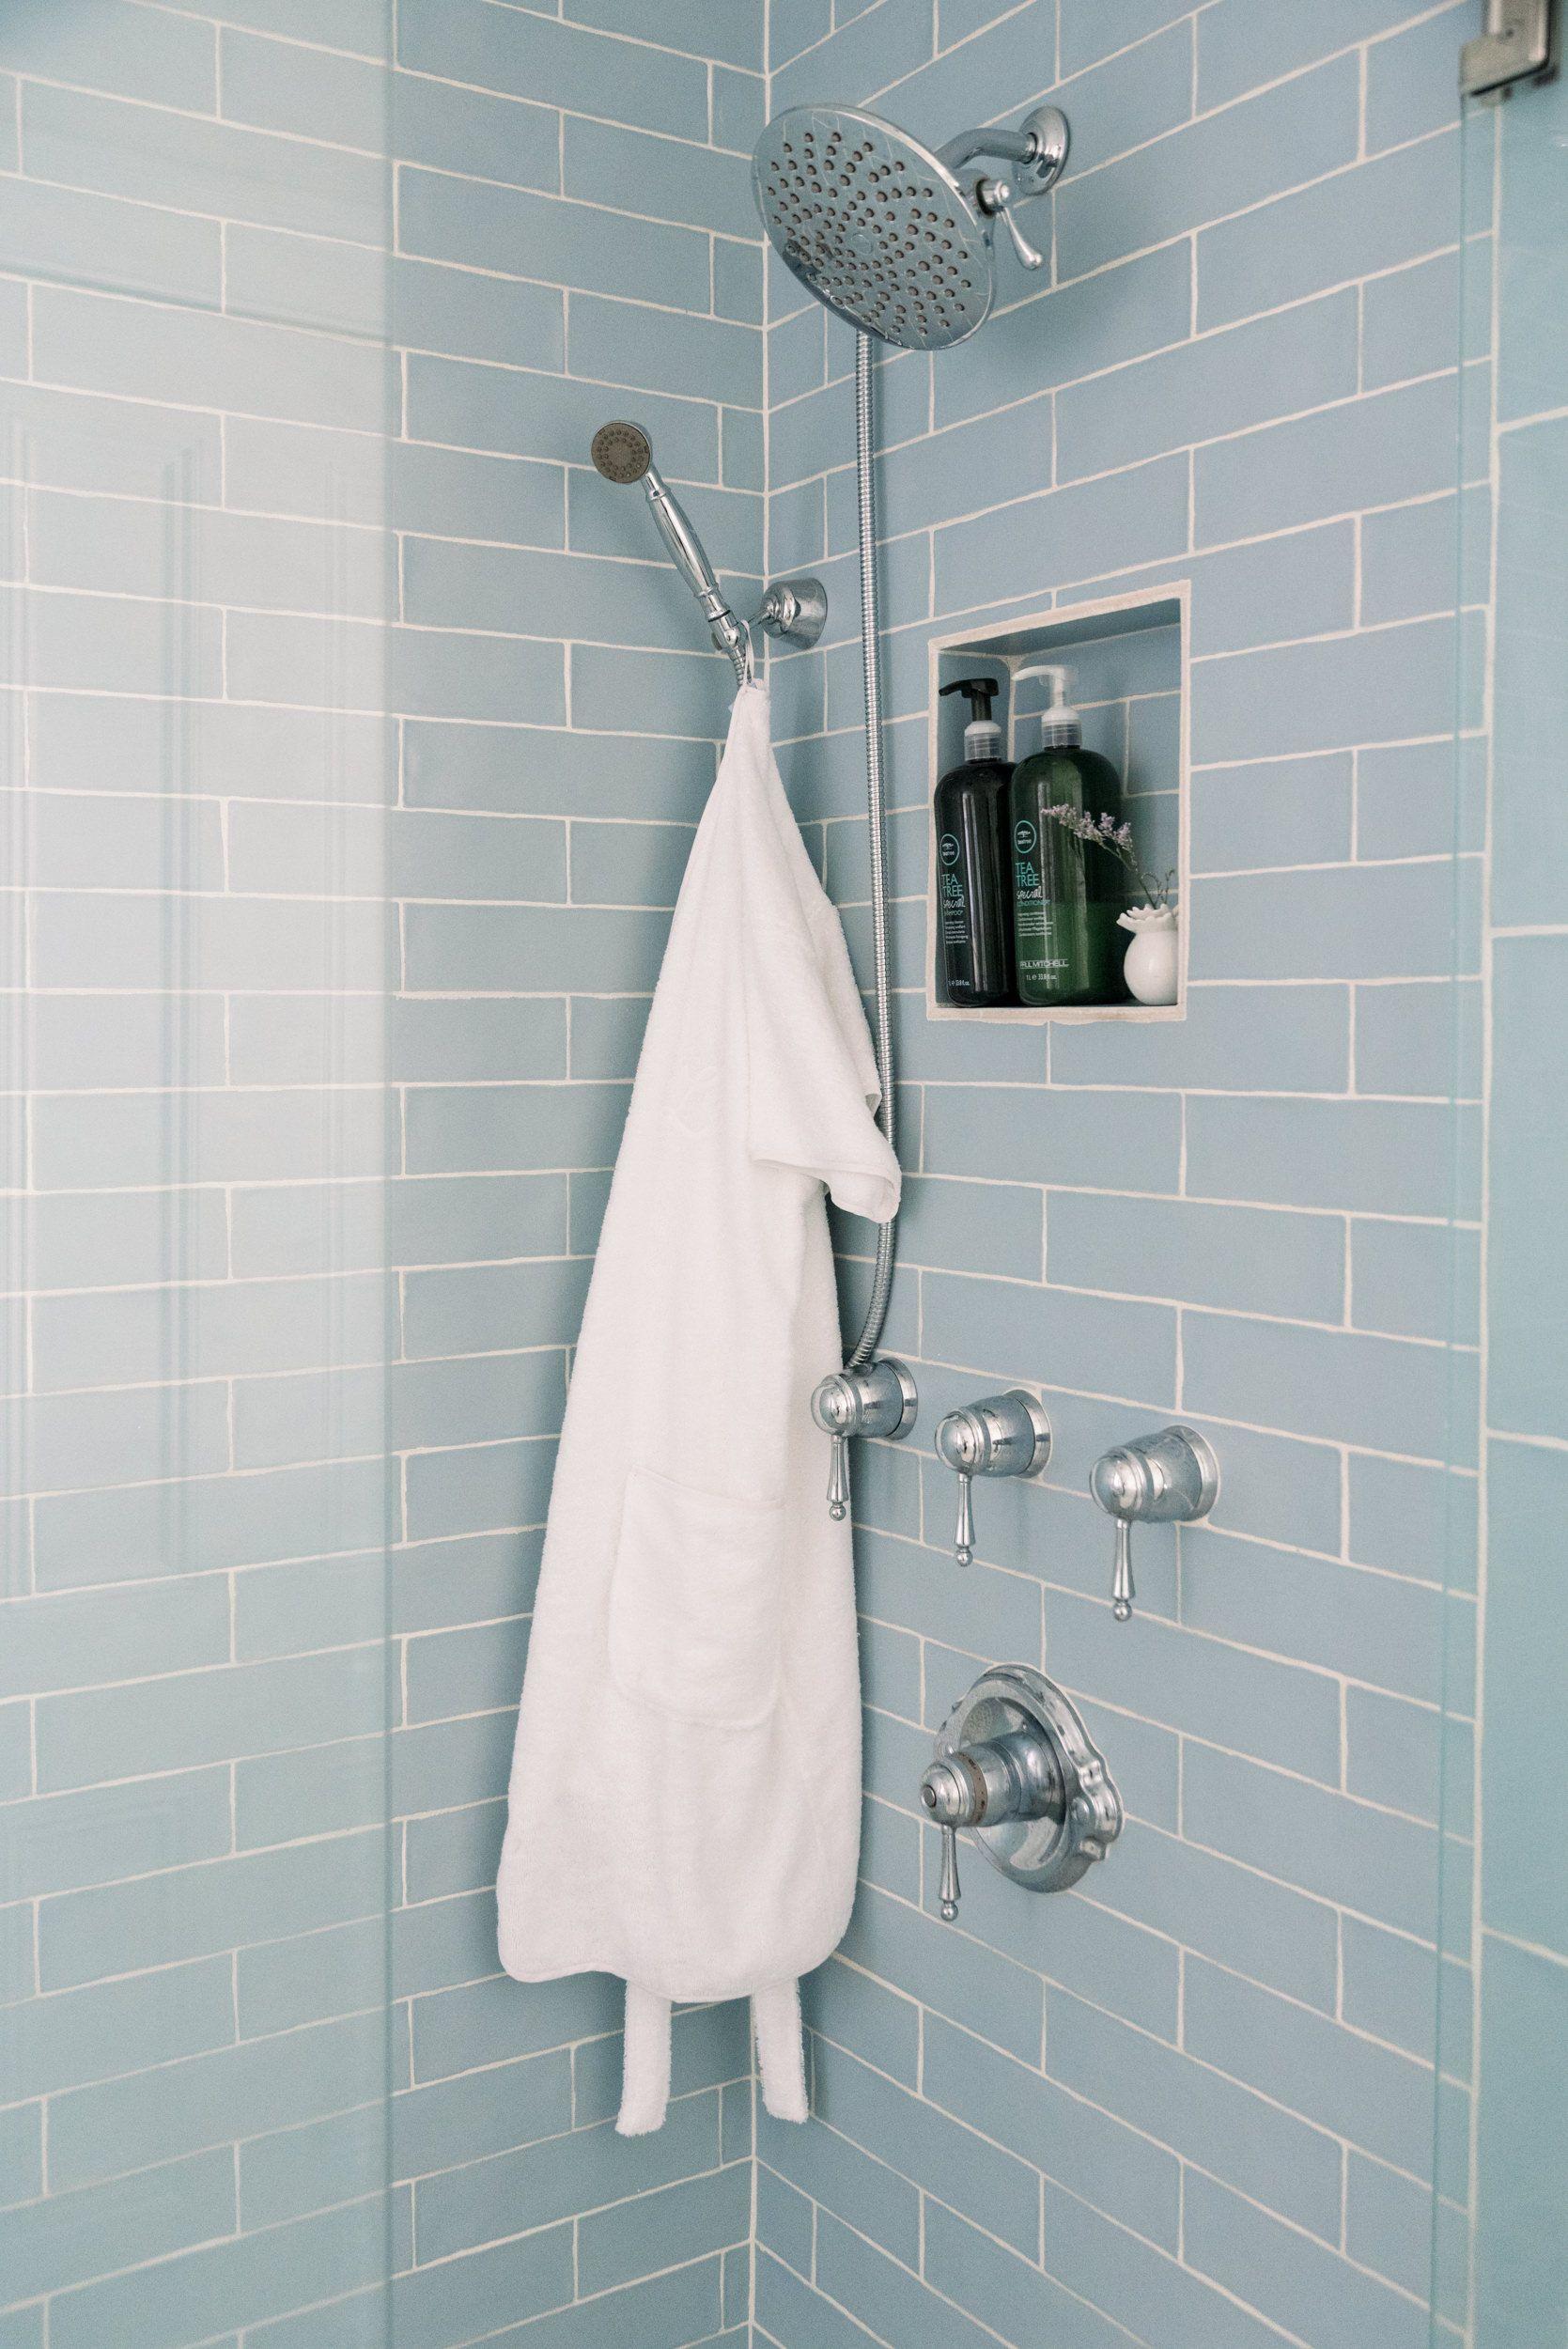 Bathroom Tile Ideas Blue Subway Tile Blue Bathroom Tile Blue Shower Tile